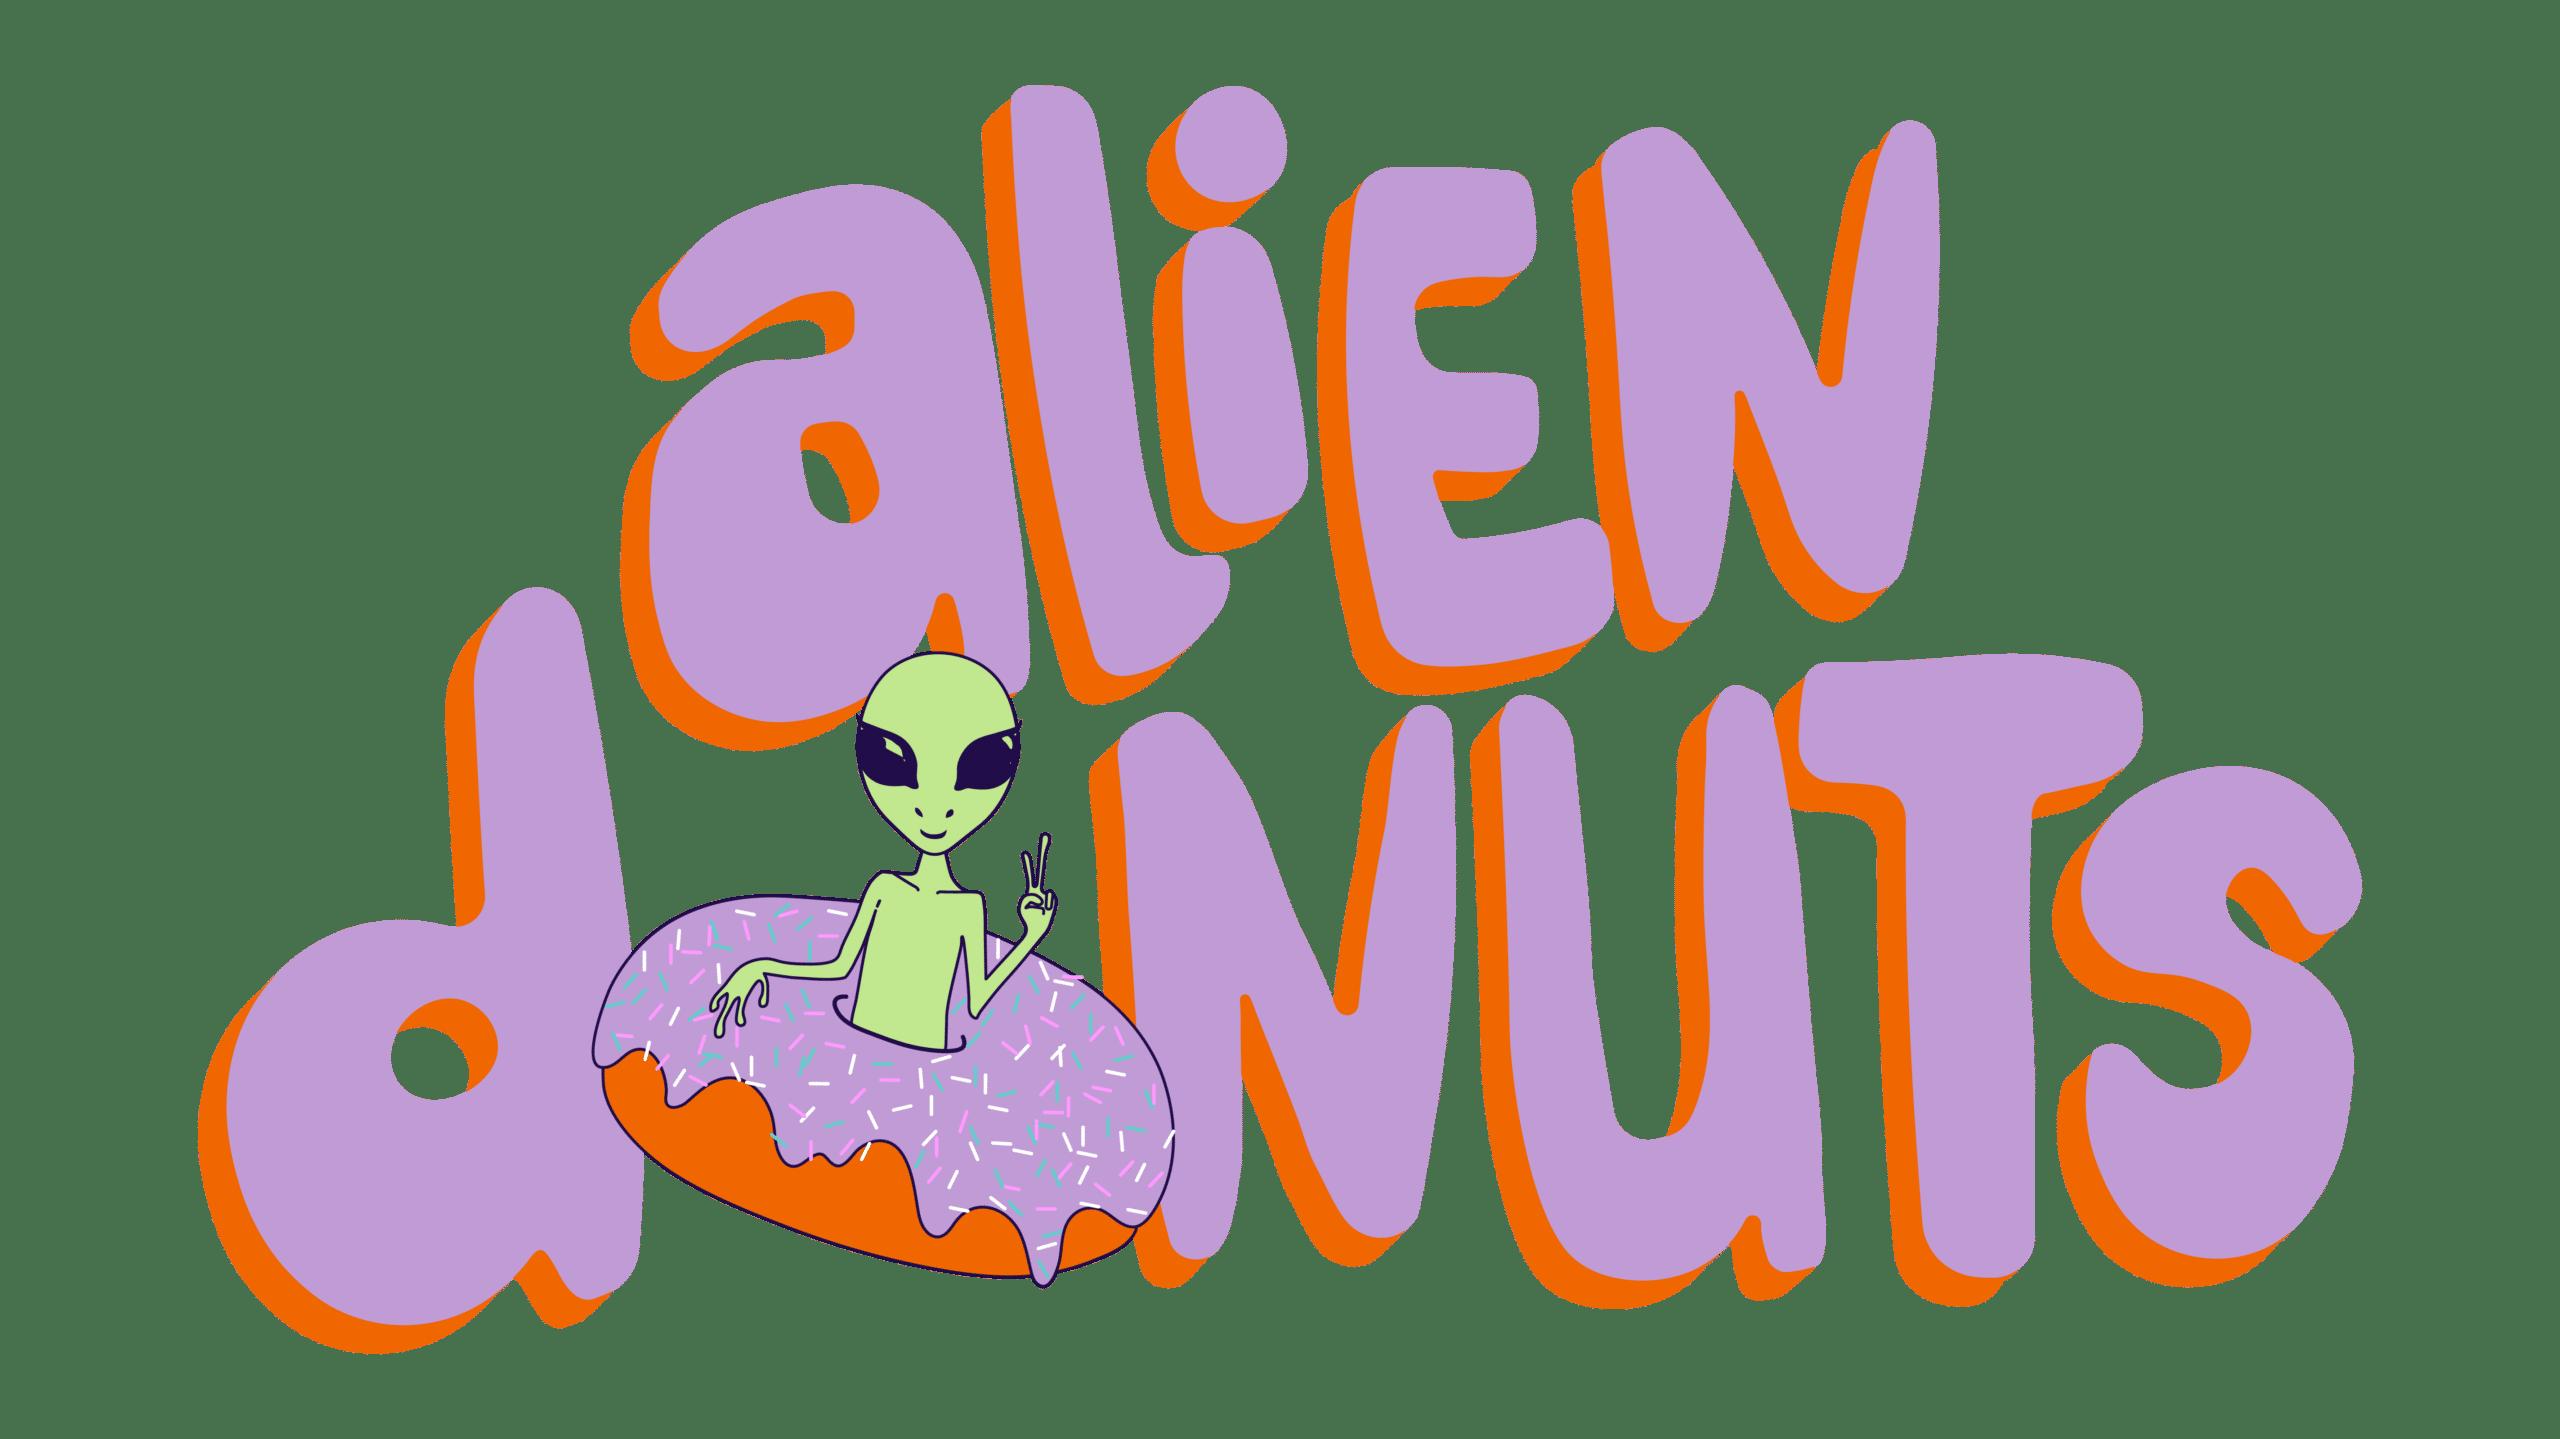 alien dounts scottsdale arizona